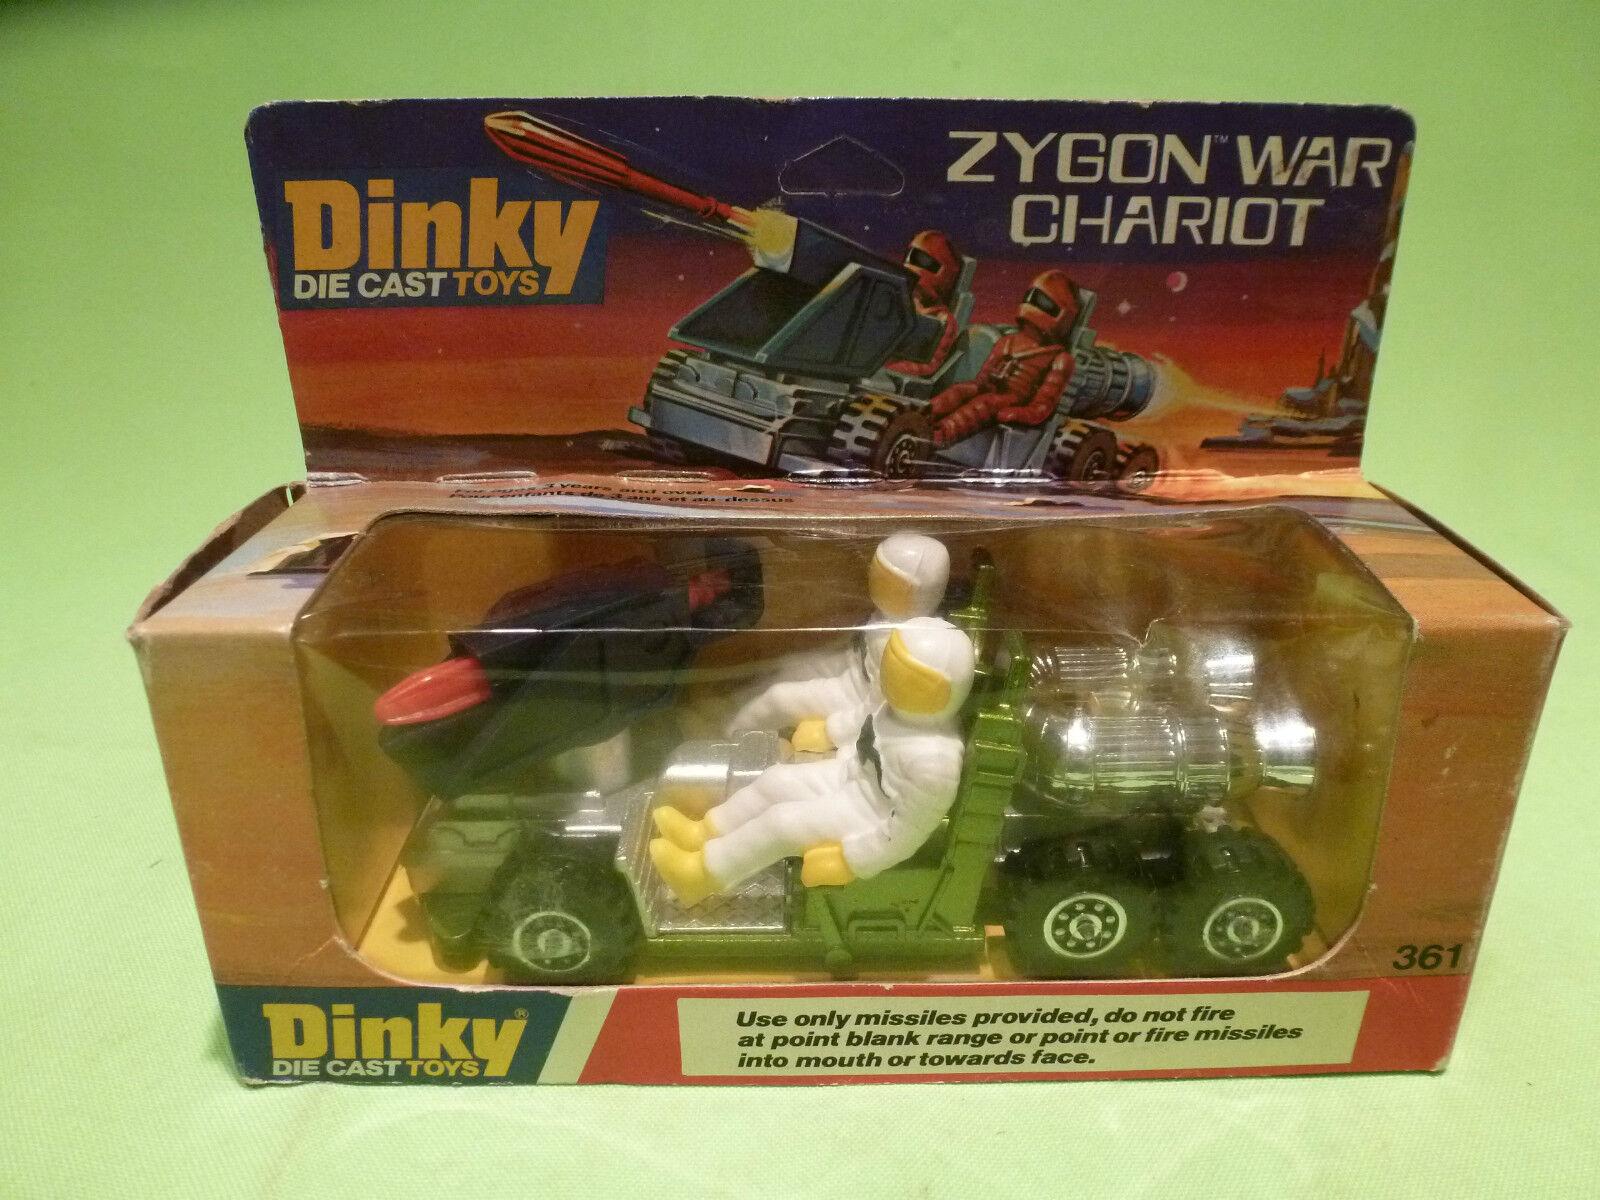 DINKY TOYS 361 ZYGON WAR CHARIOT - vert + blanc - RARE SELTEN - GOOD COND.